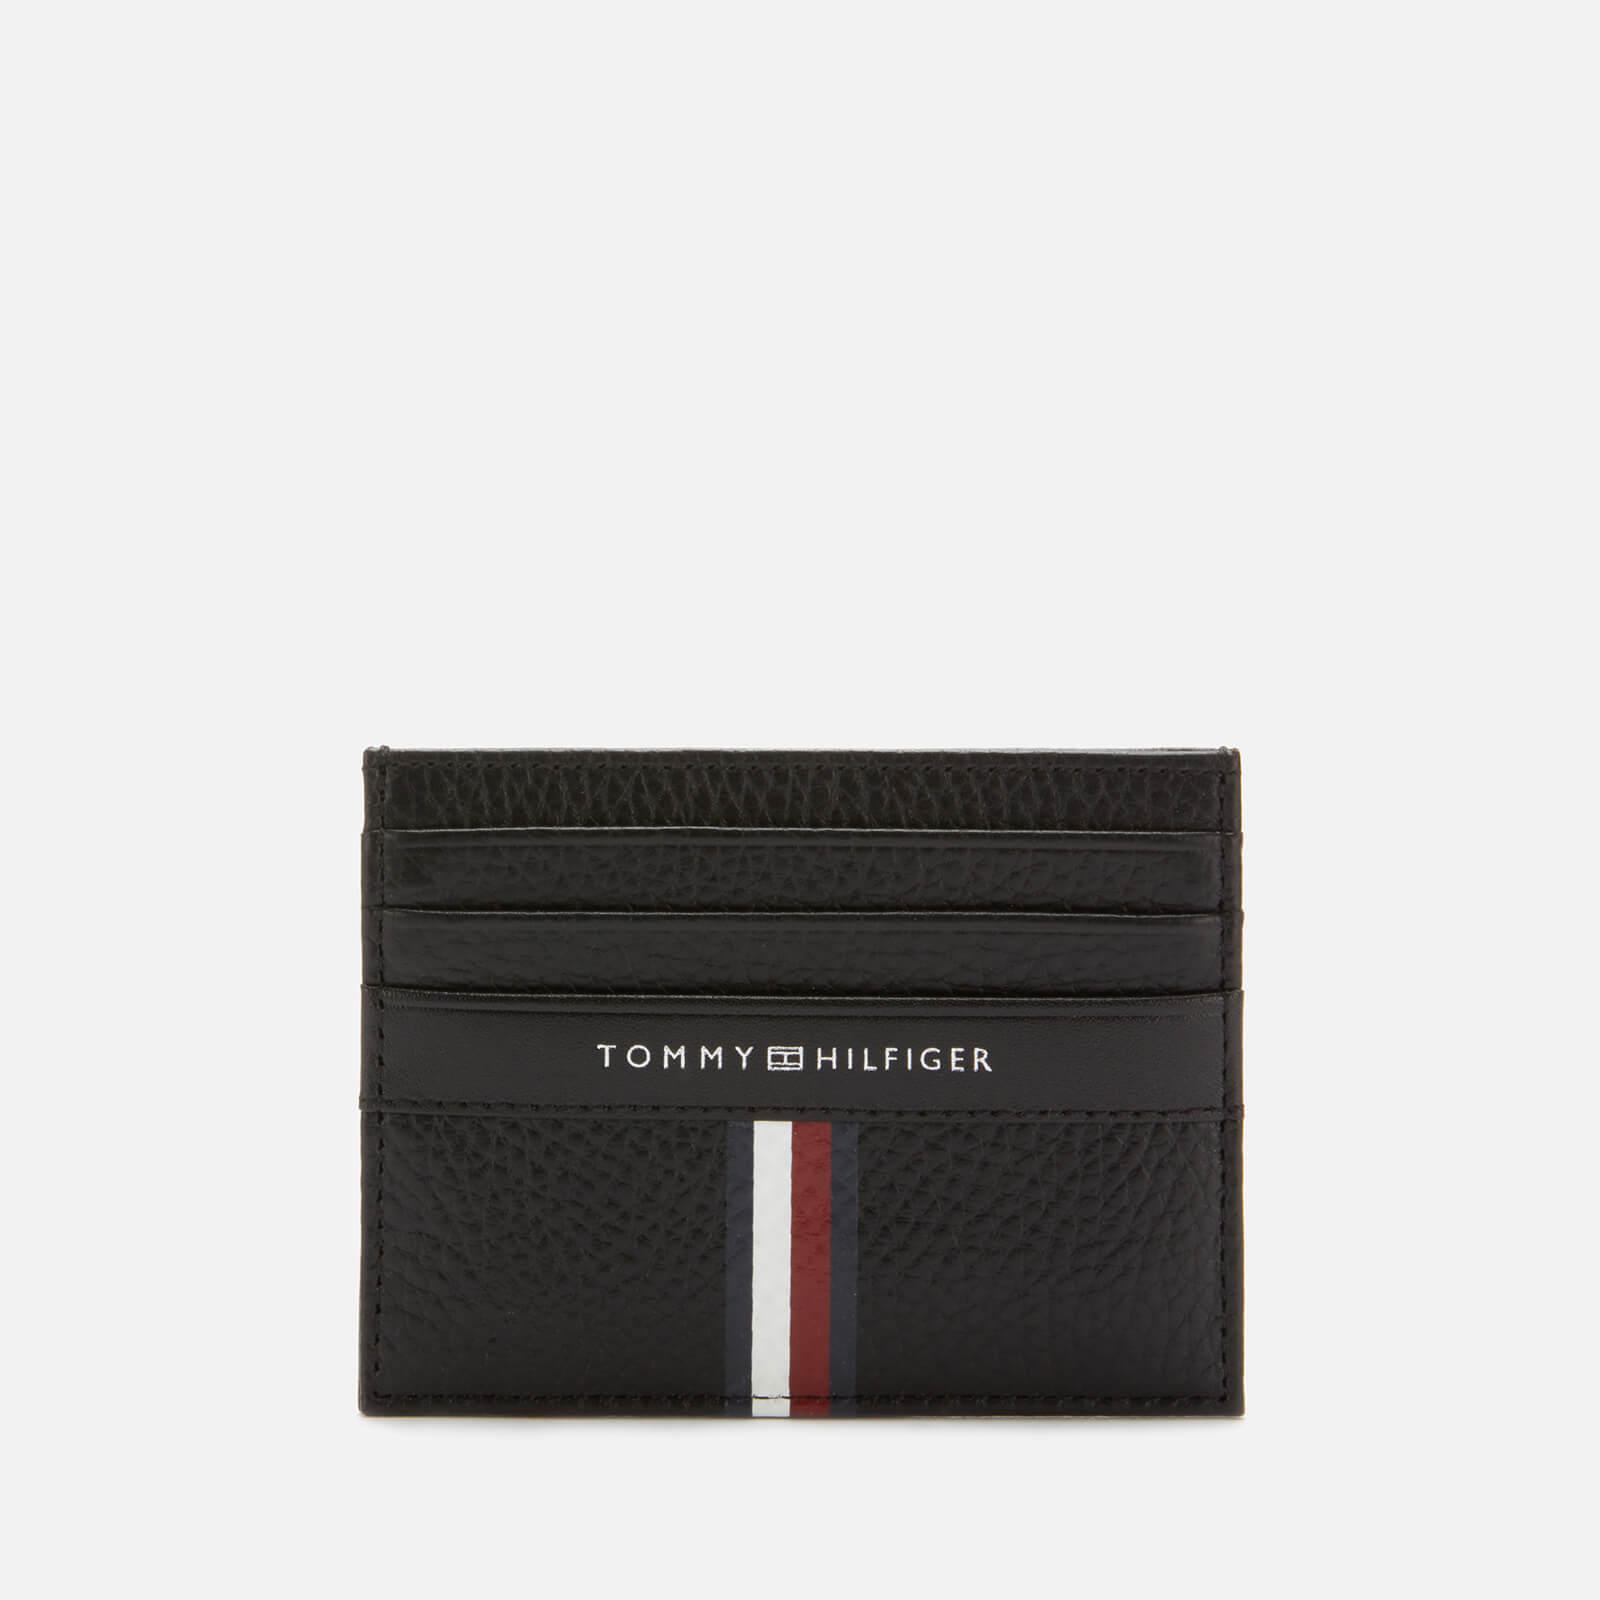 Tommy Hilfiger Men's Corporate Leather Mini Credit Card Holder - Black